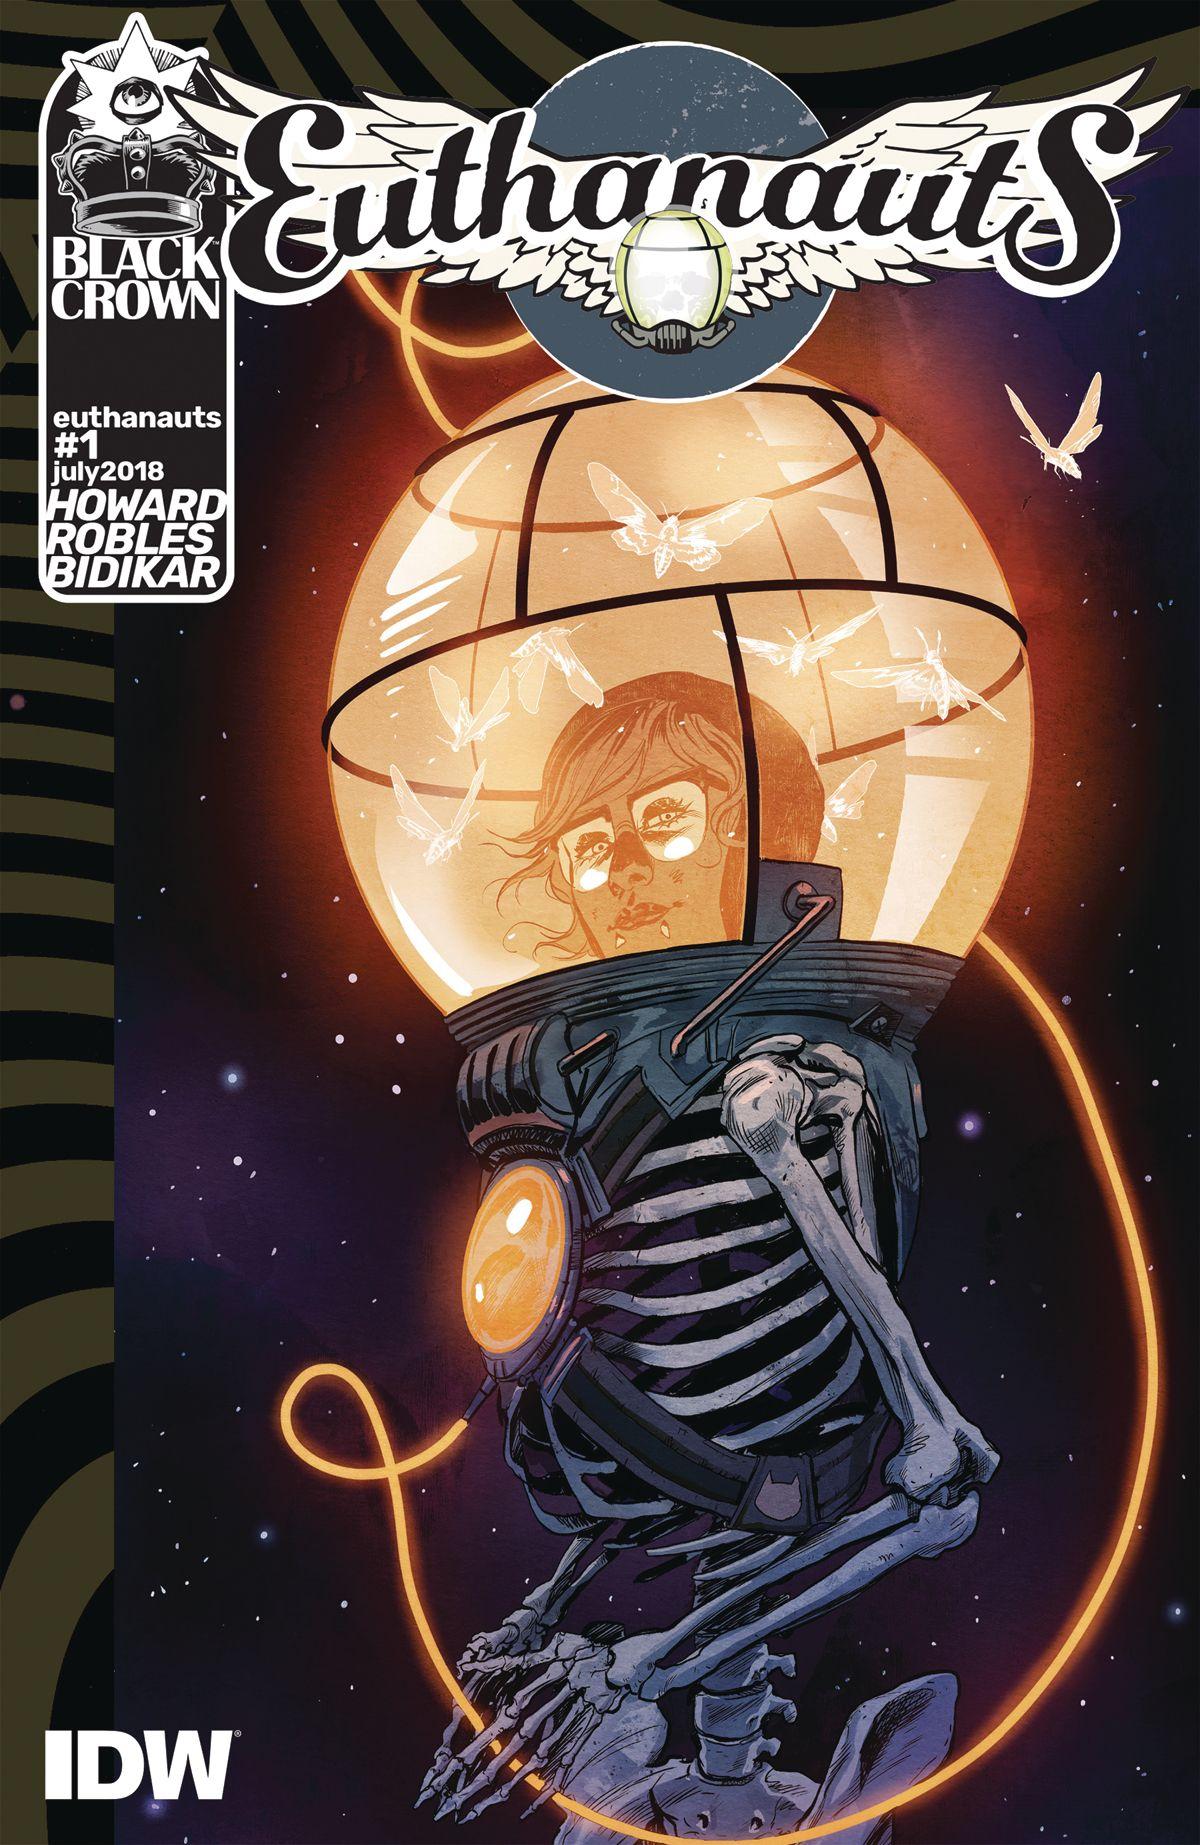 Black Crown Comics